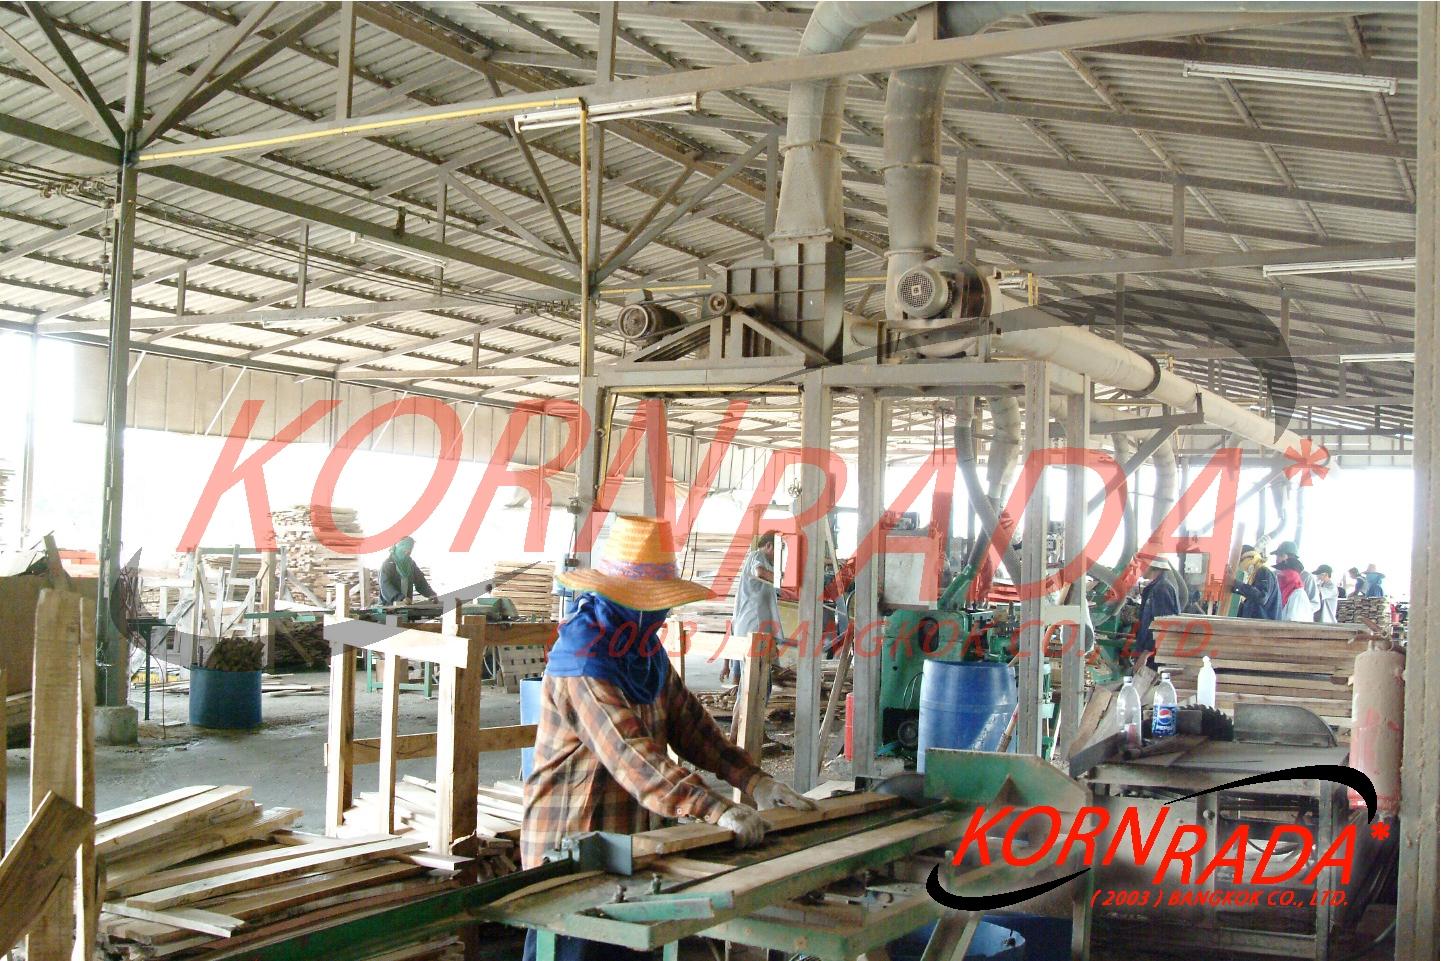 kornrada_production_1589